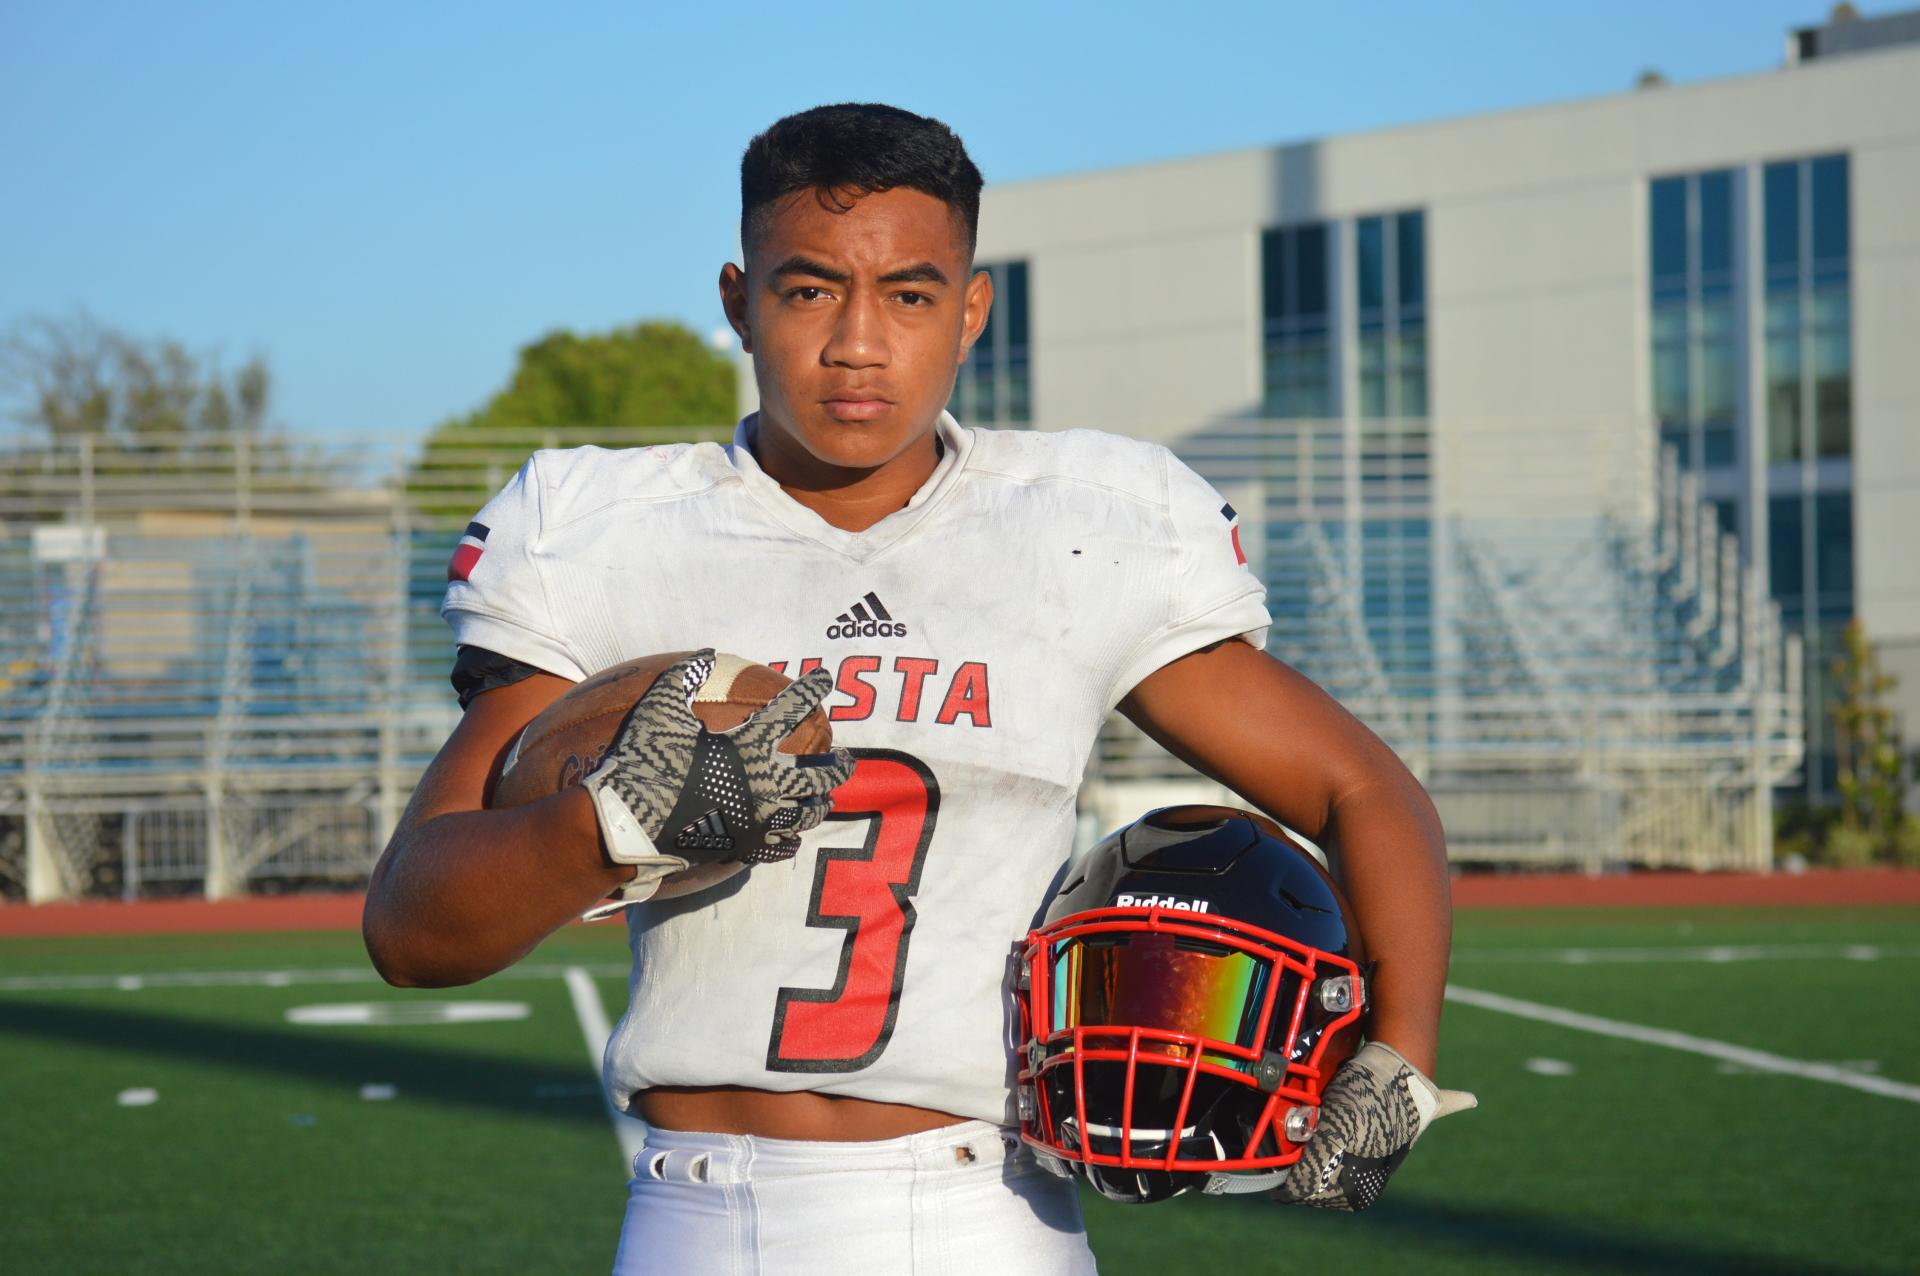 Vista High School - Athlete Desmond Taua